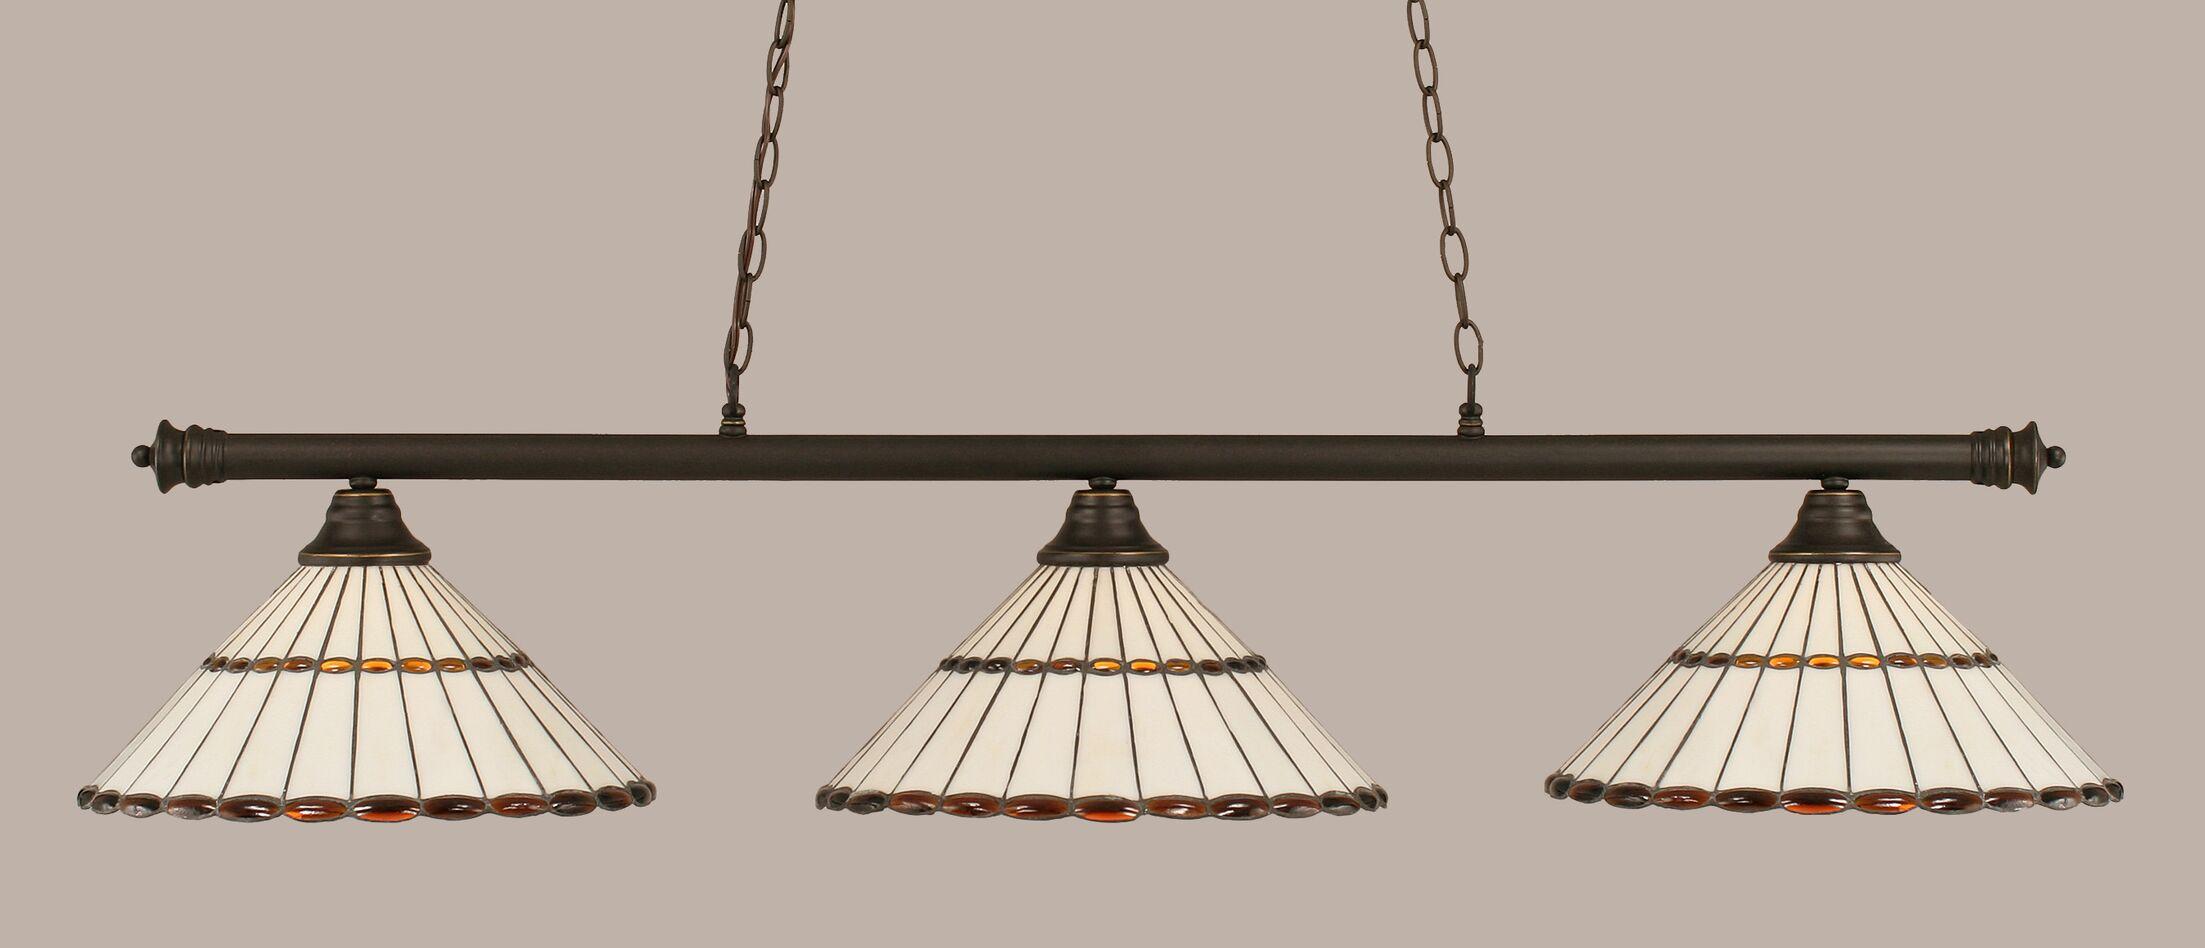 Mendez 3-Light Hardwired Billiard Light Finish: Dark Granite, Shade Color: Honey and Amber Brown